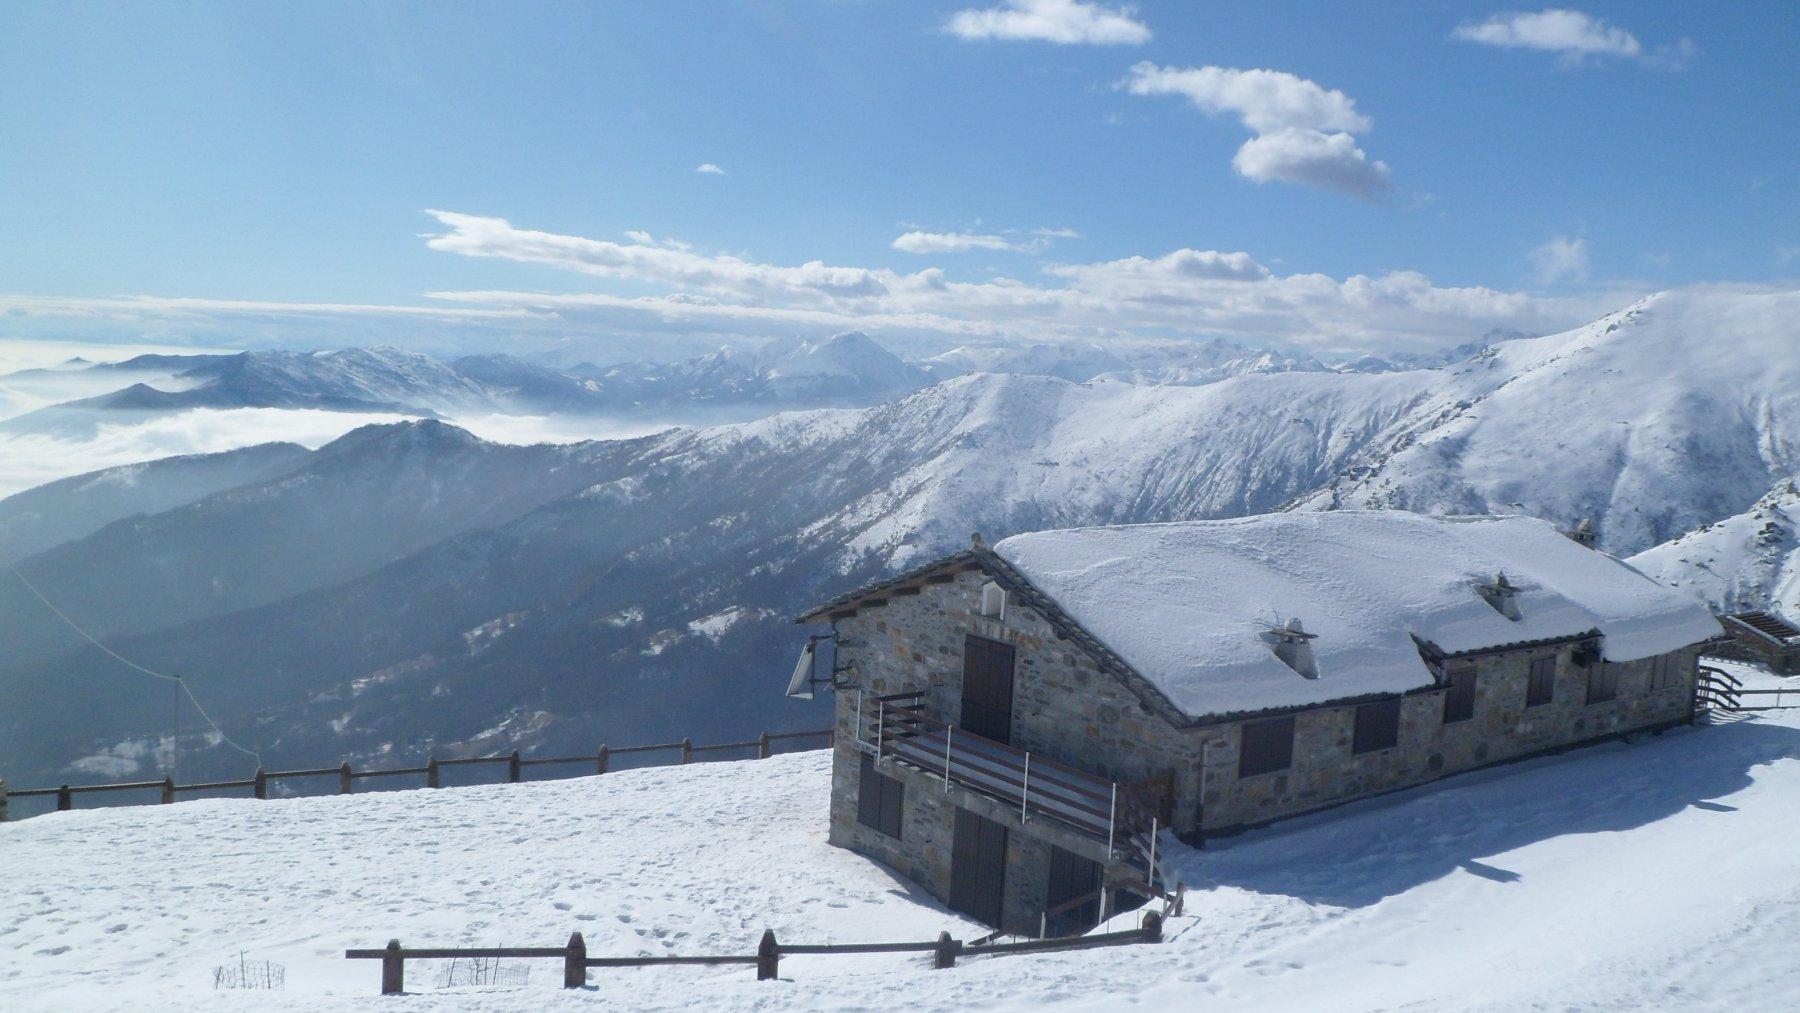 Rifugio Alpe Soglia